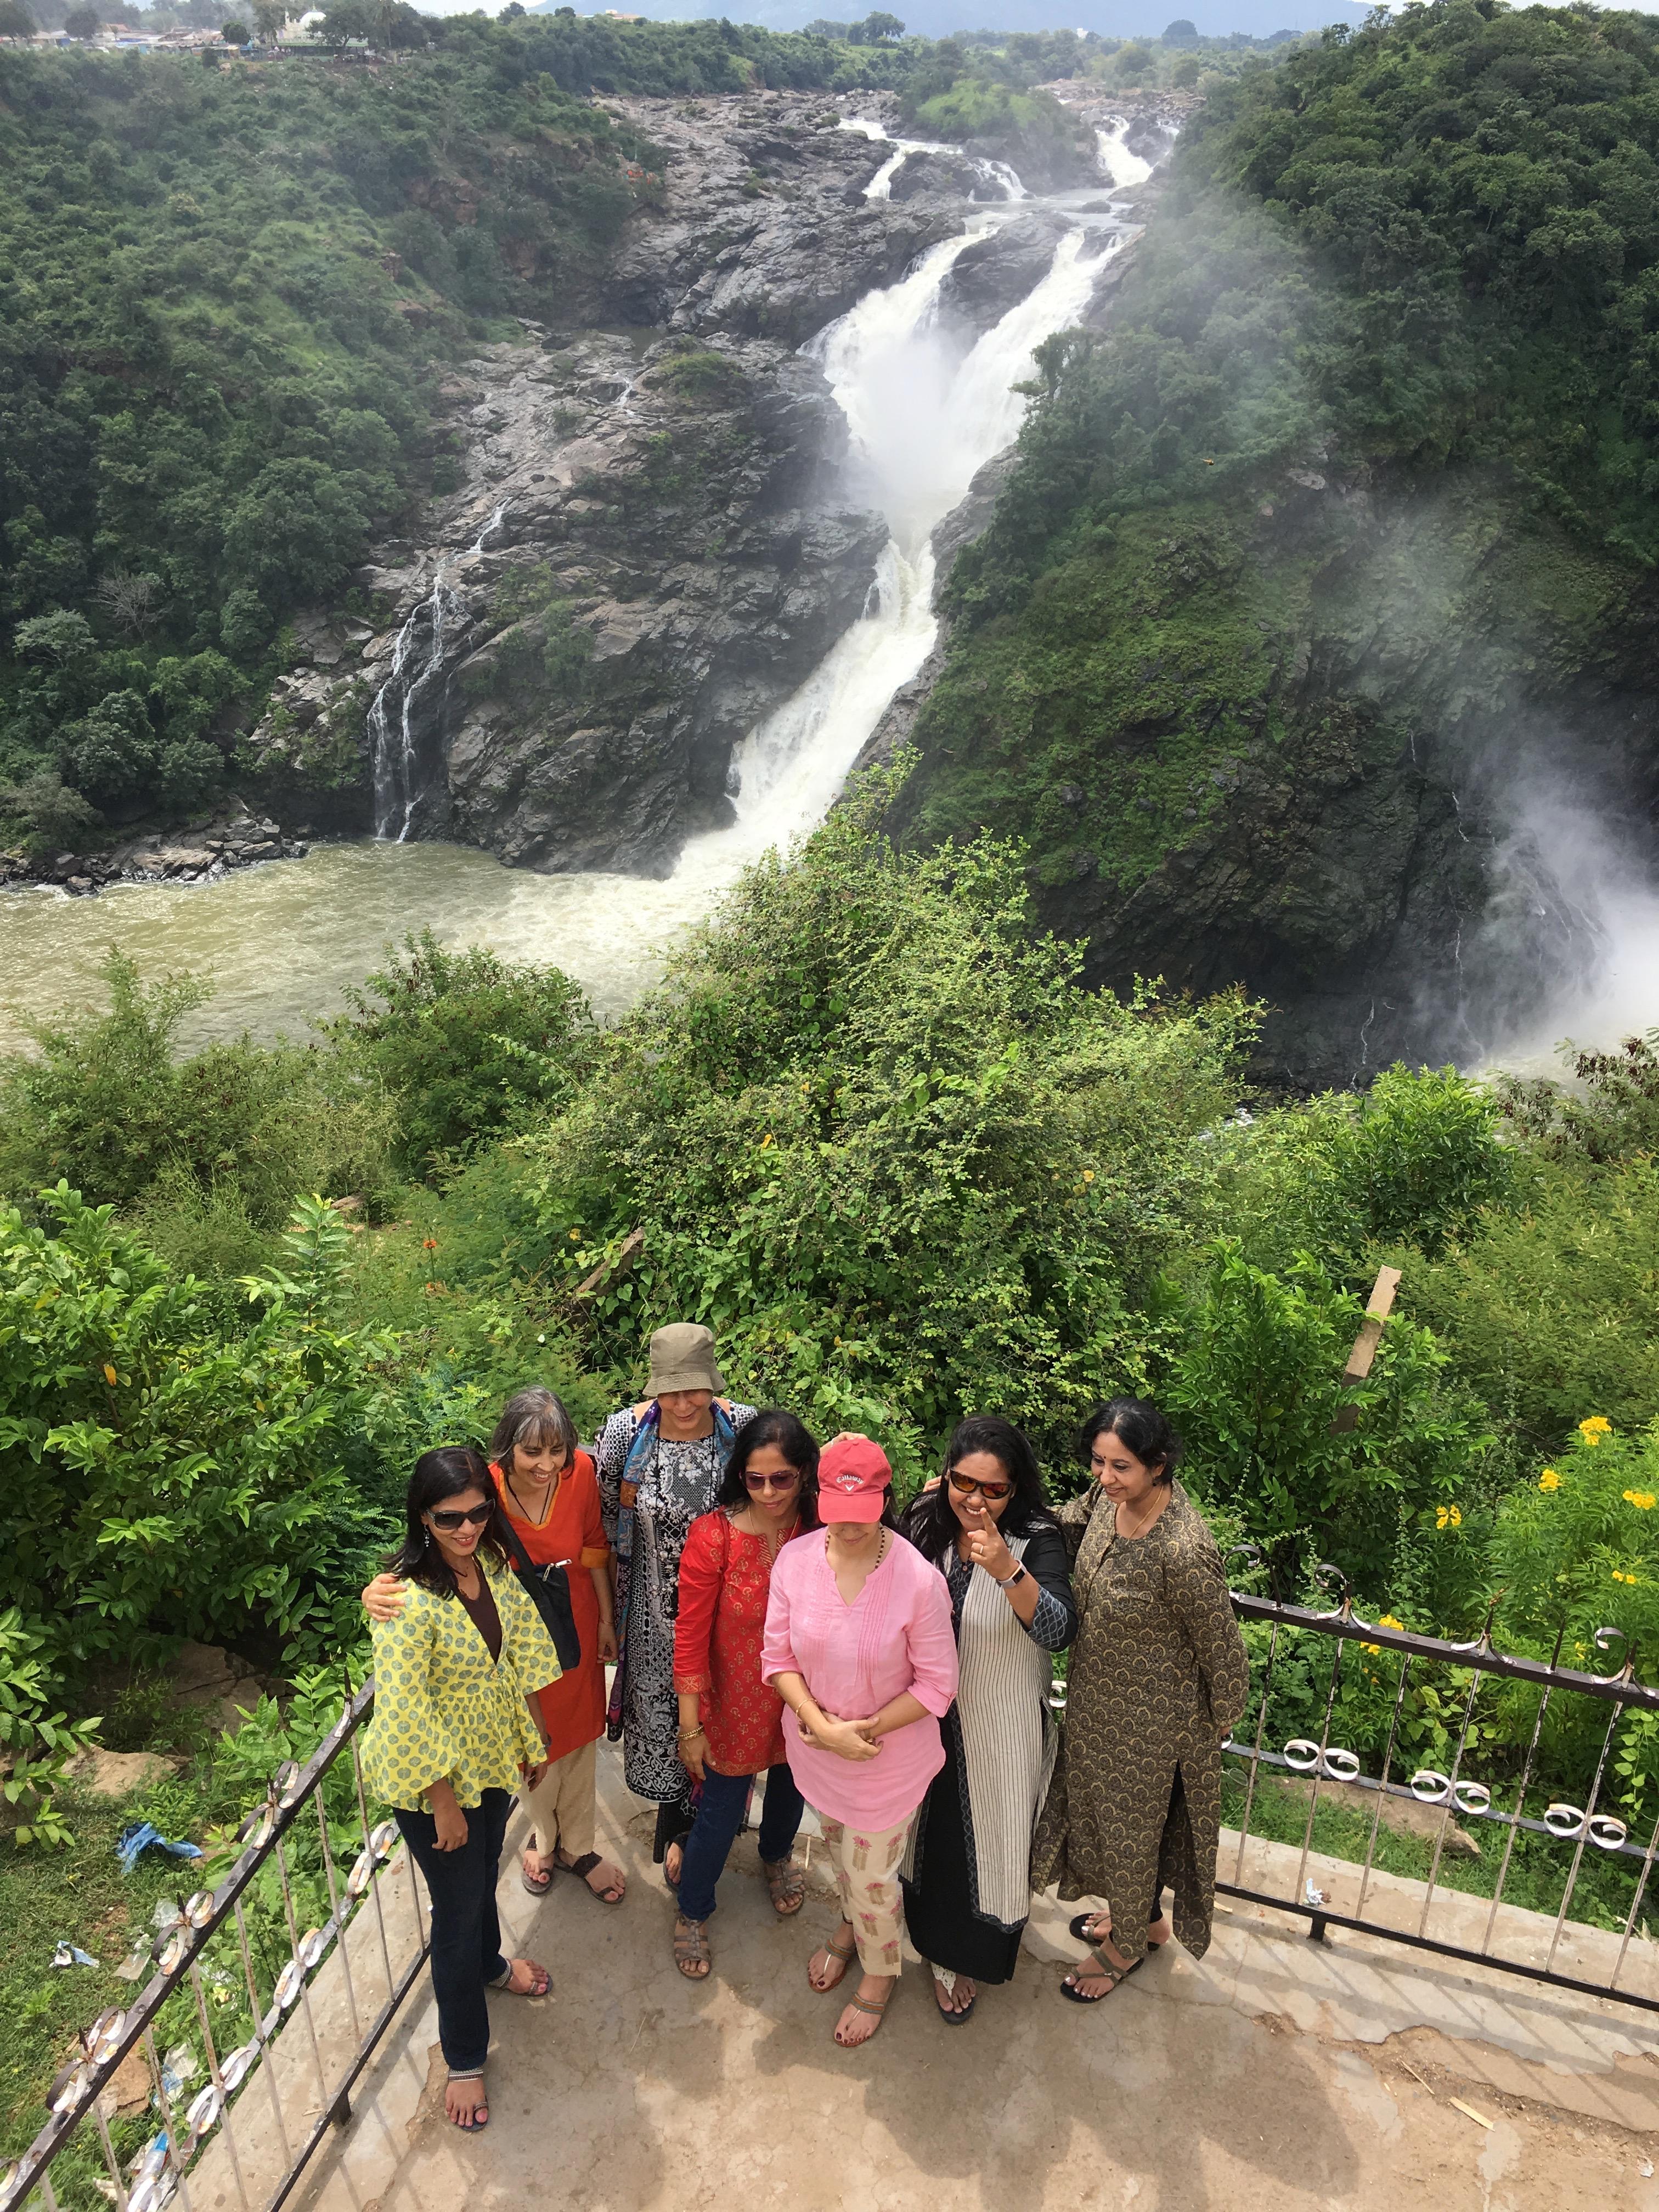 Shivanasamudra ,Talakad, Somnathpura : Day Trips in Bangalore 7.30AM – 3.30PM (Trip 12)